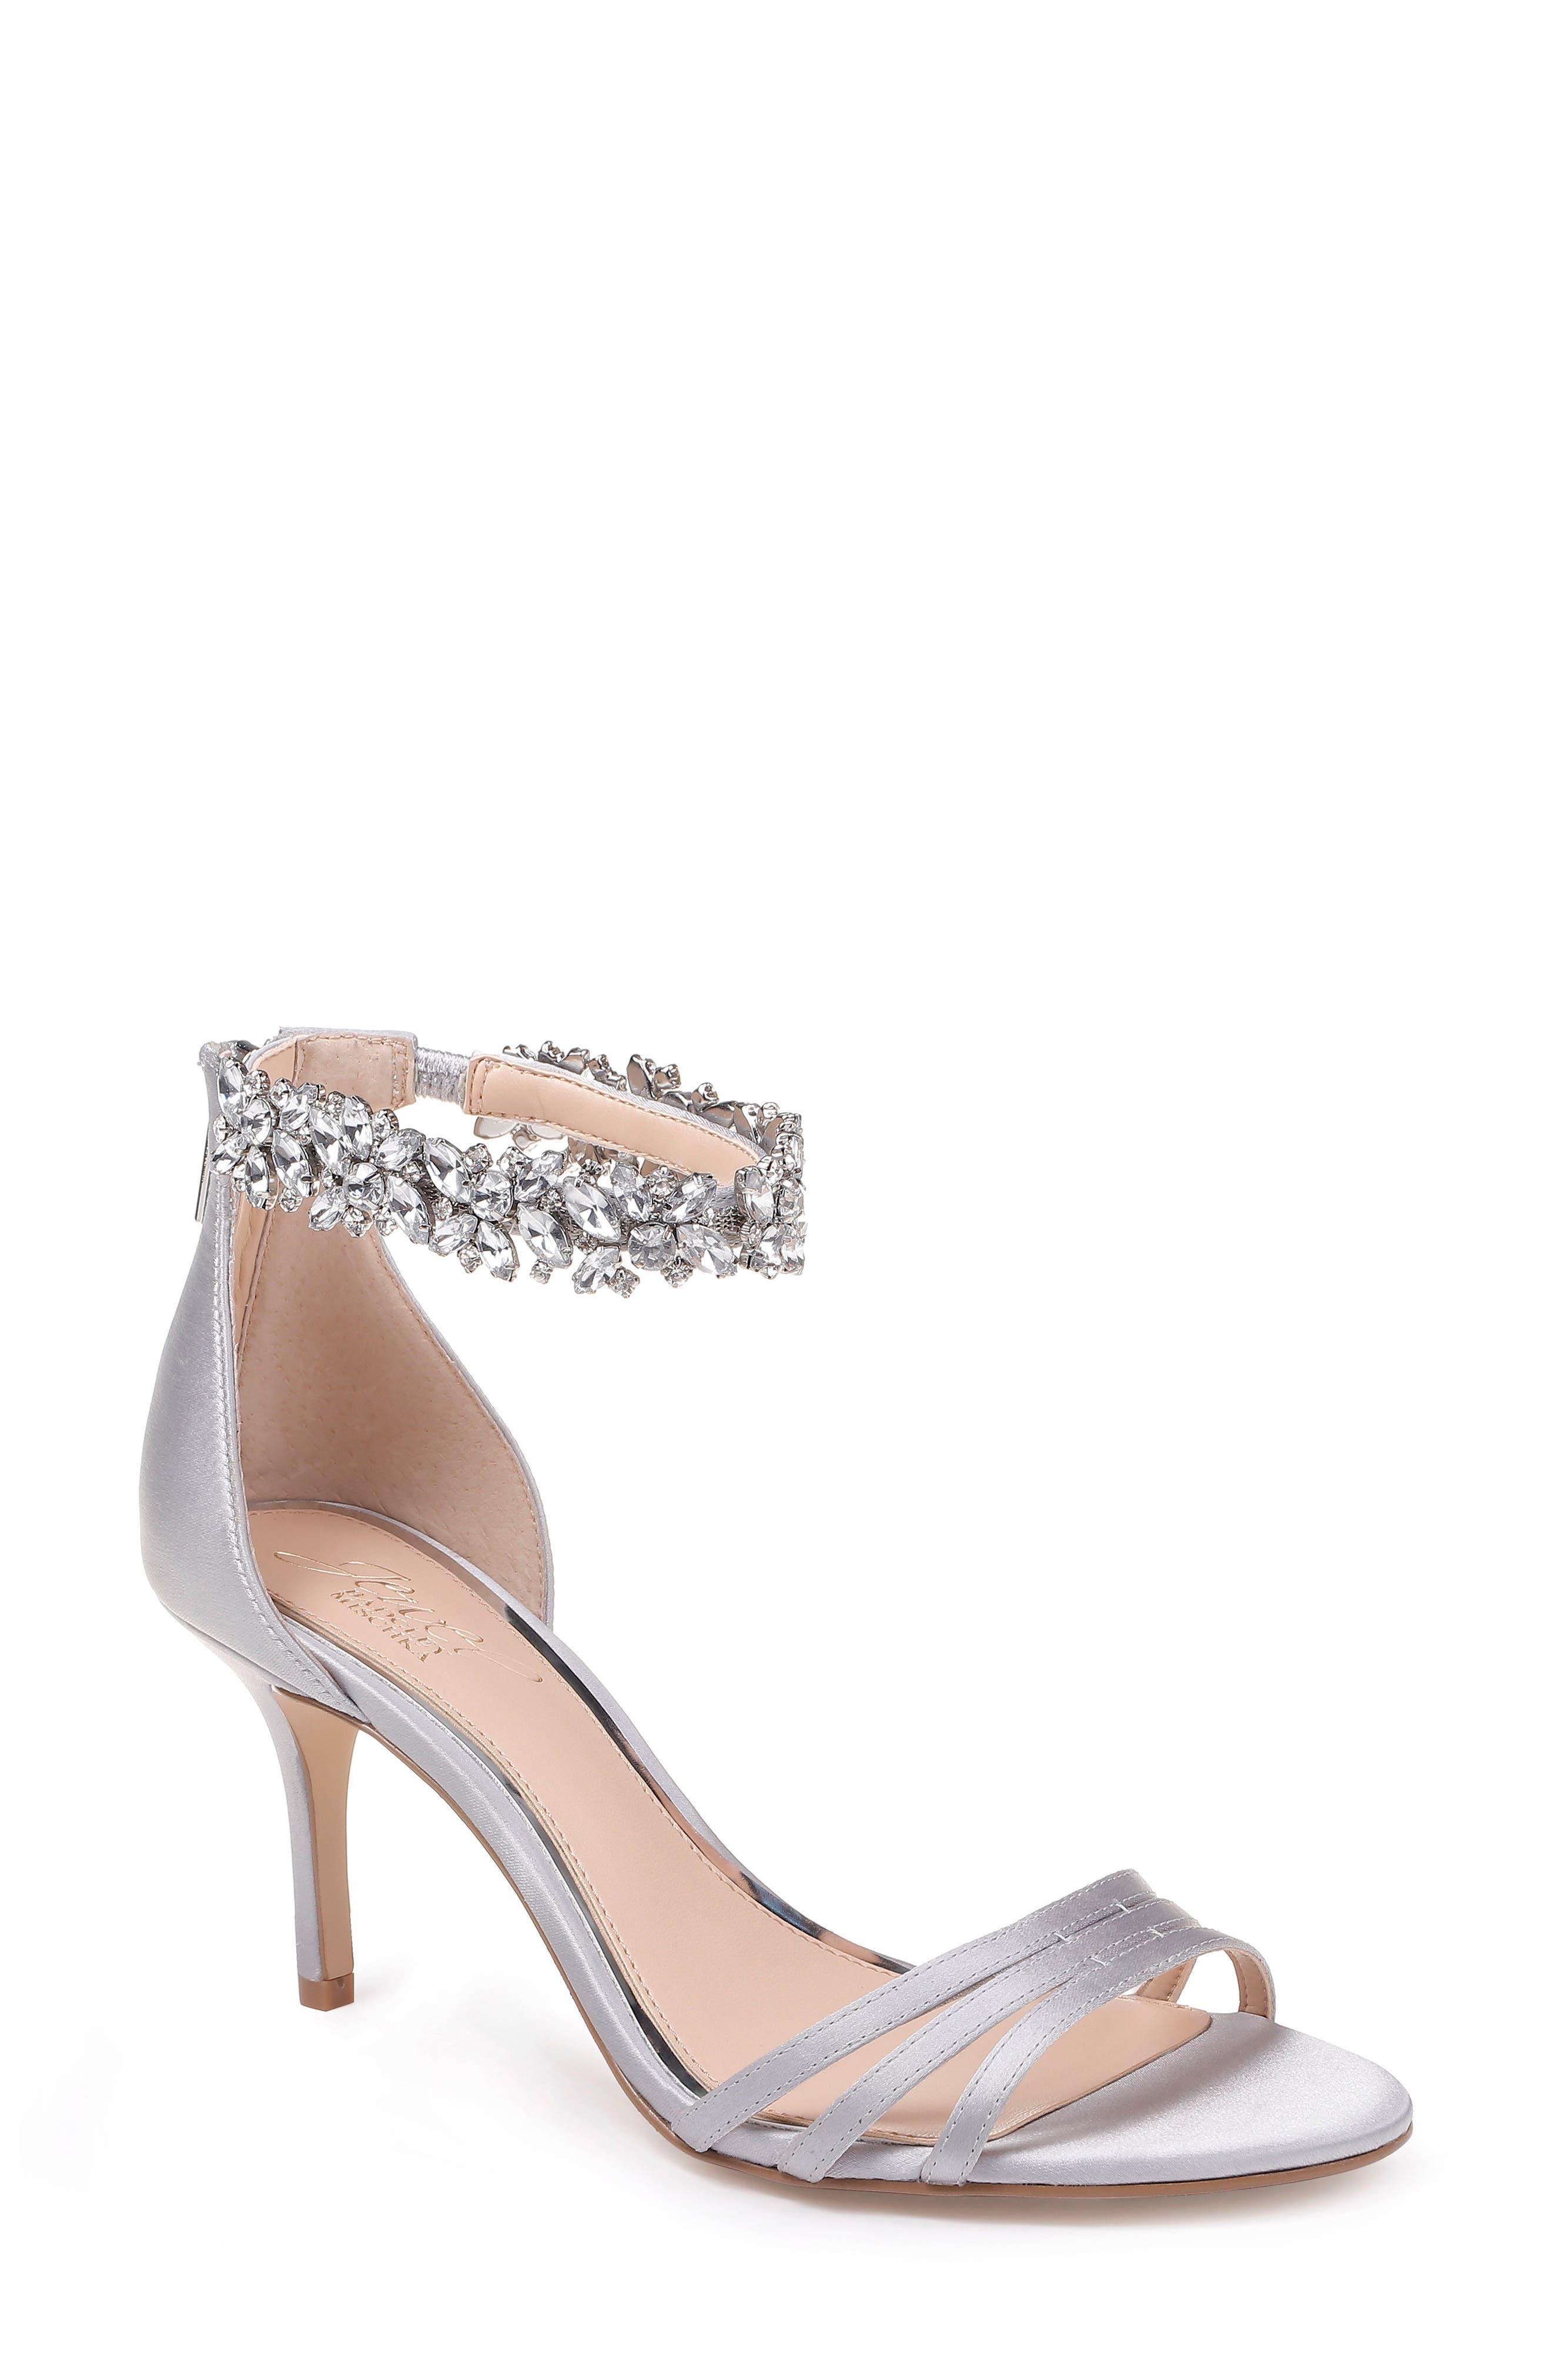 Jewel Badgley Mischka Zamora Ankle Strap Sandal, Metallic